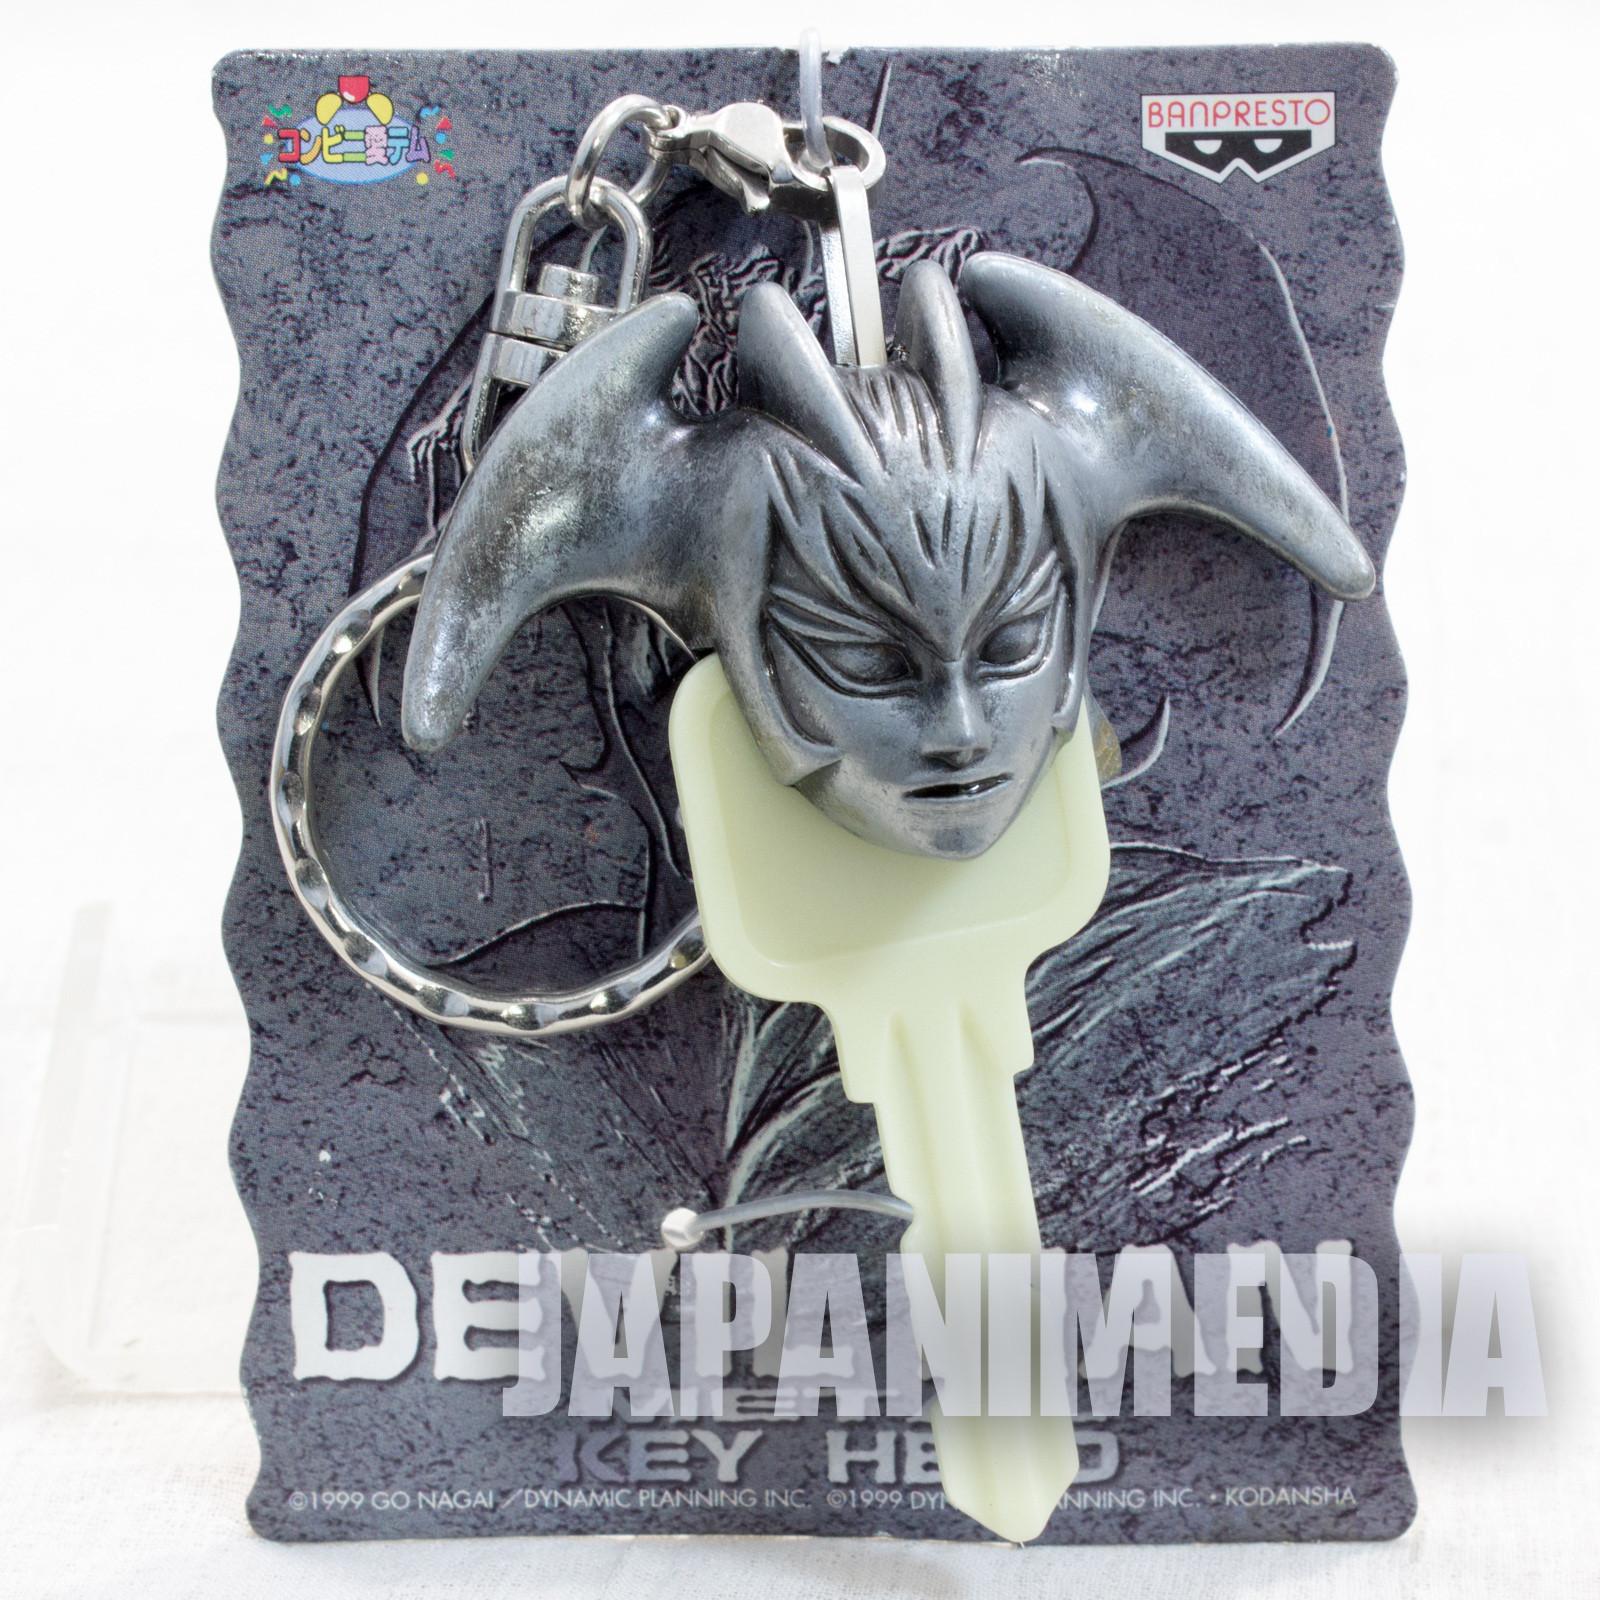 Devilman Lady ver. Metal Key Head Cover Keychain Banpresto JAPAN ANIME